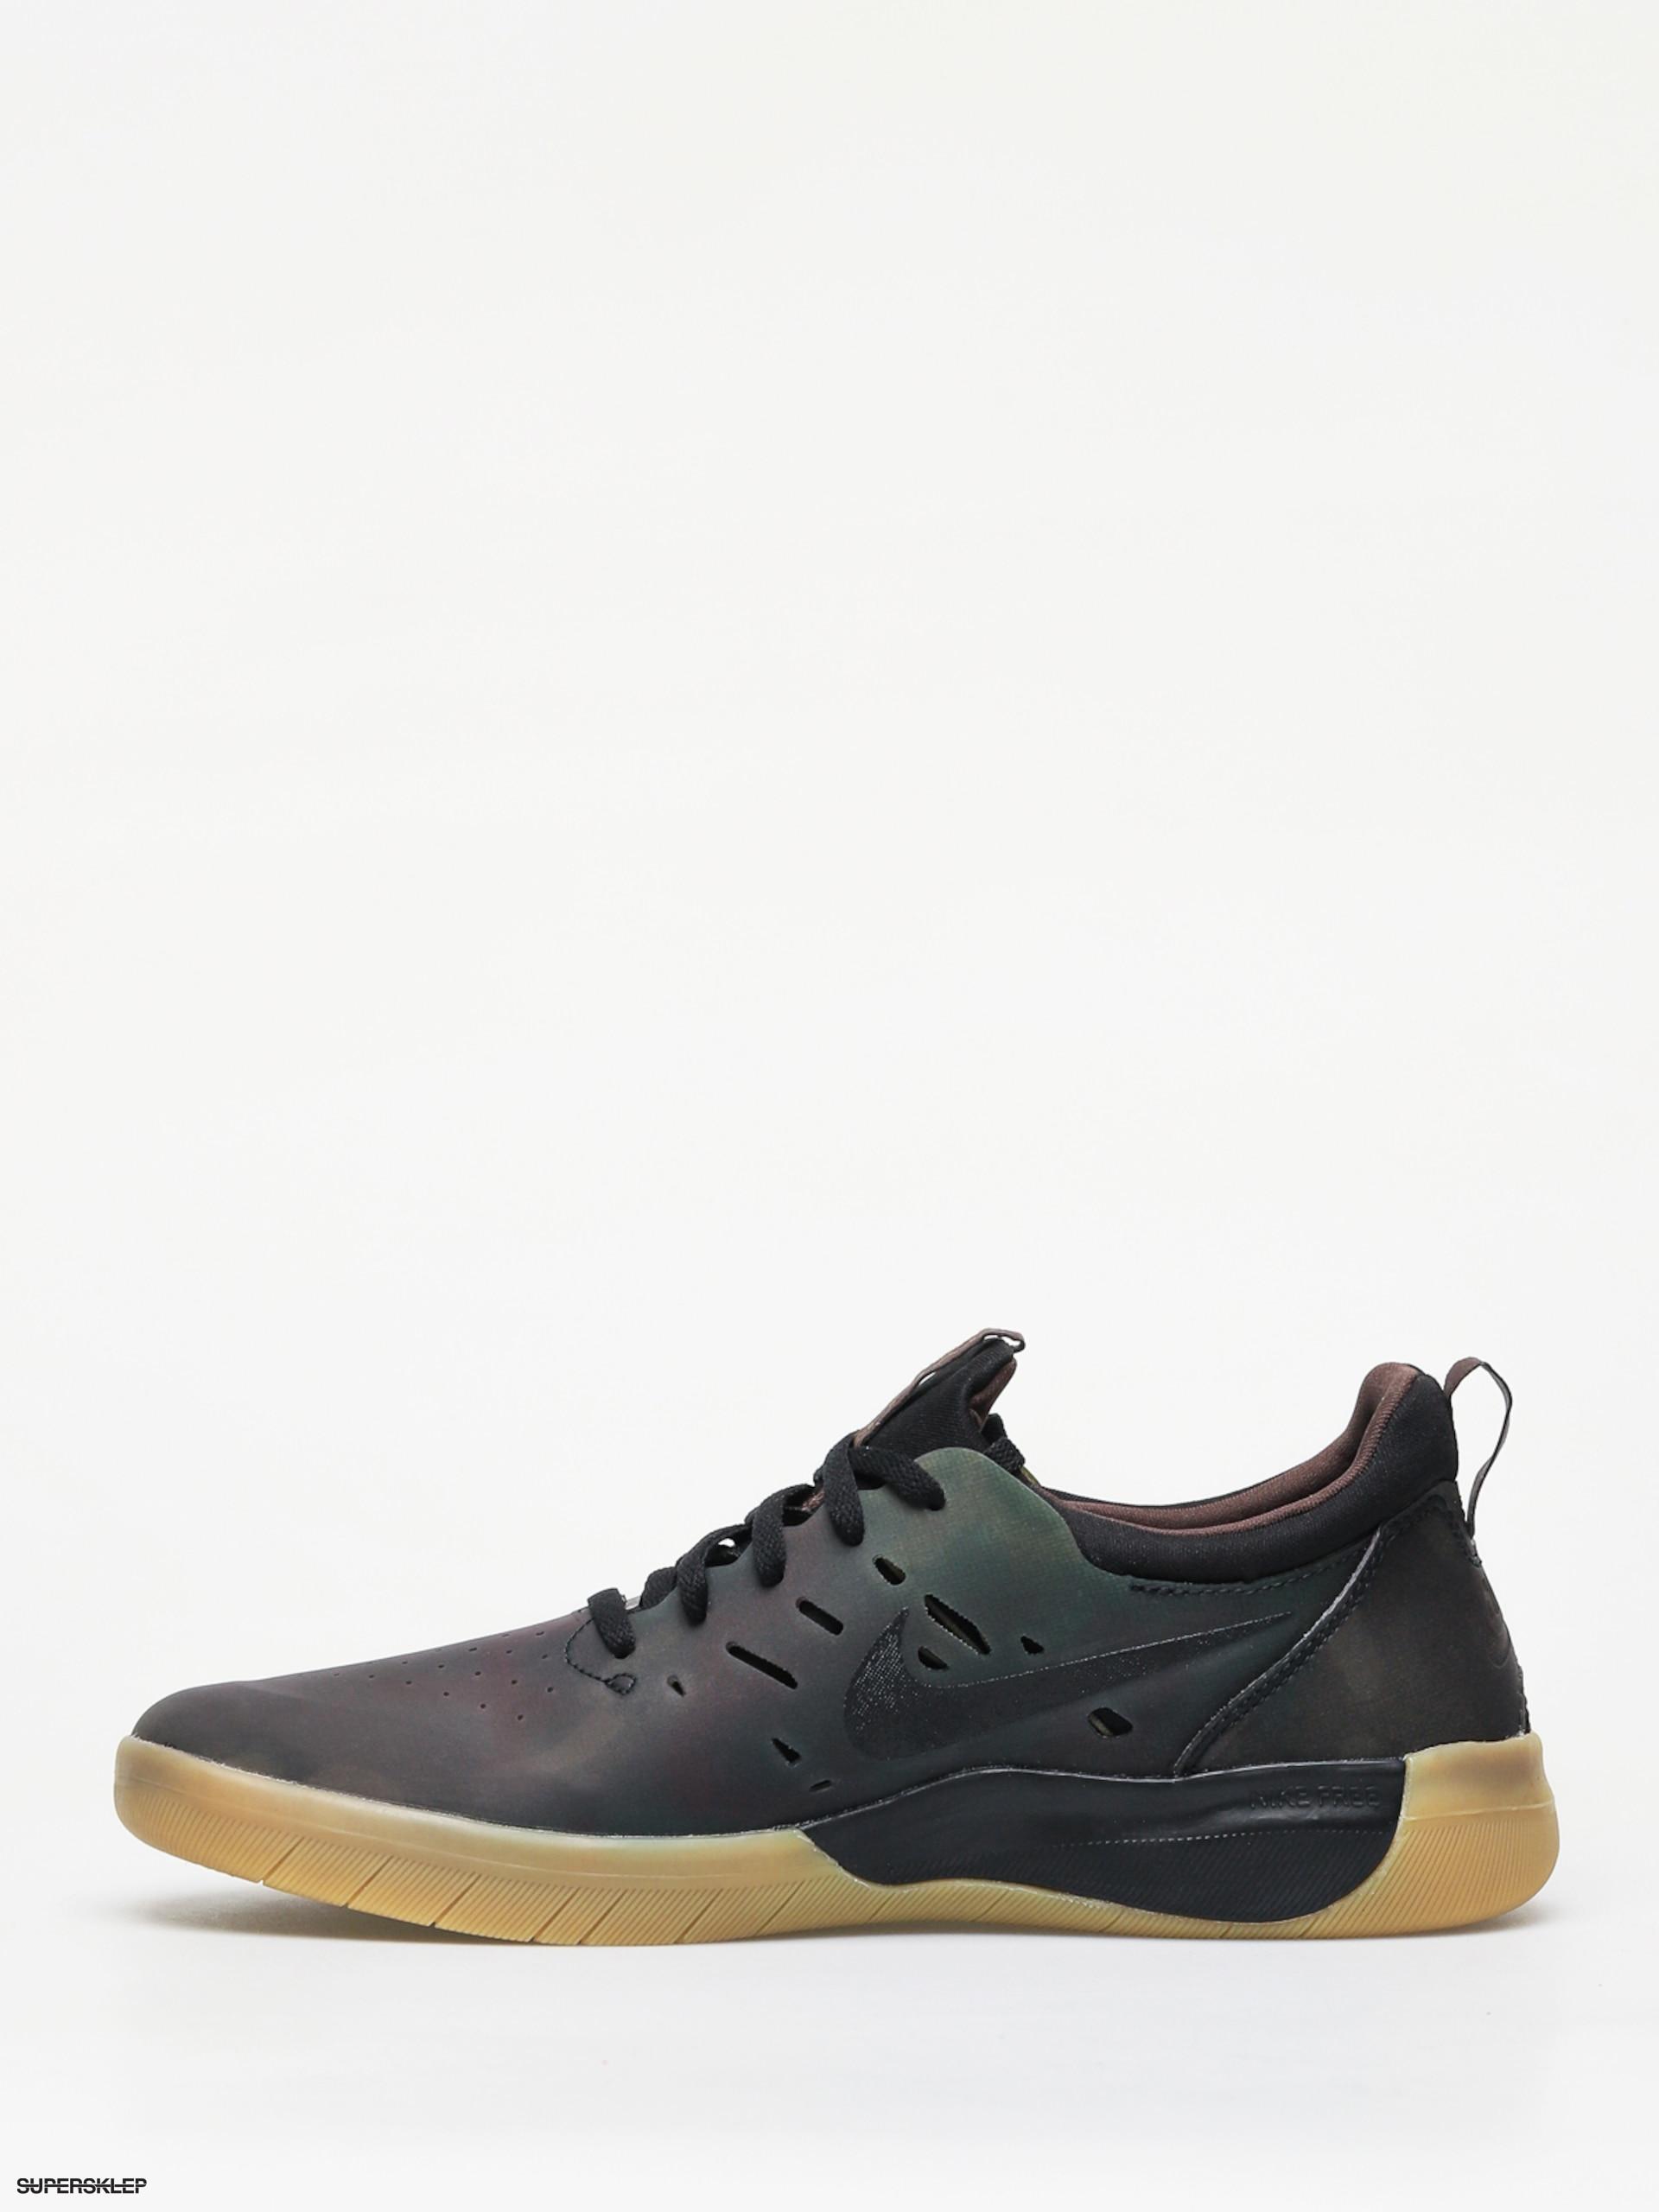 ecbba1fa73f2 Buty Nike SB Sb Nyjah Free Prm (multi color black gum light brown)